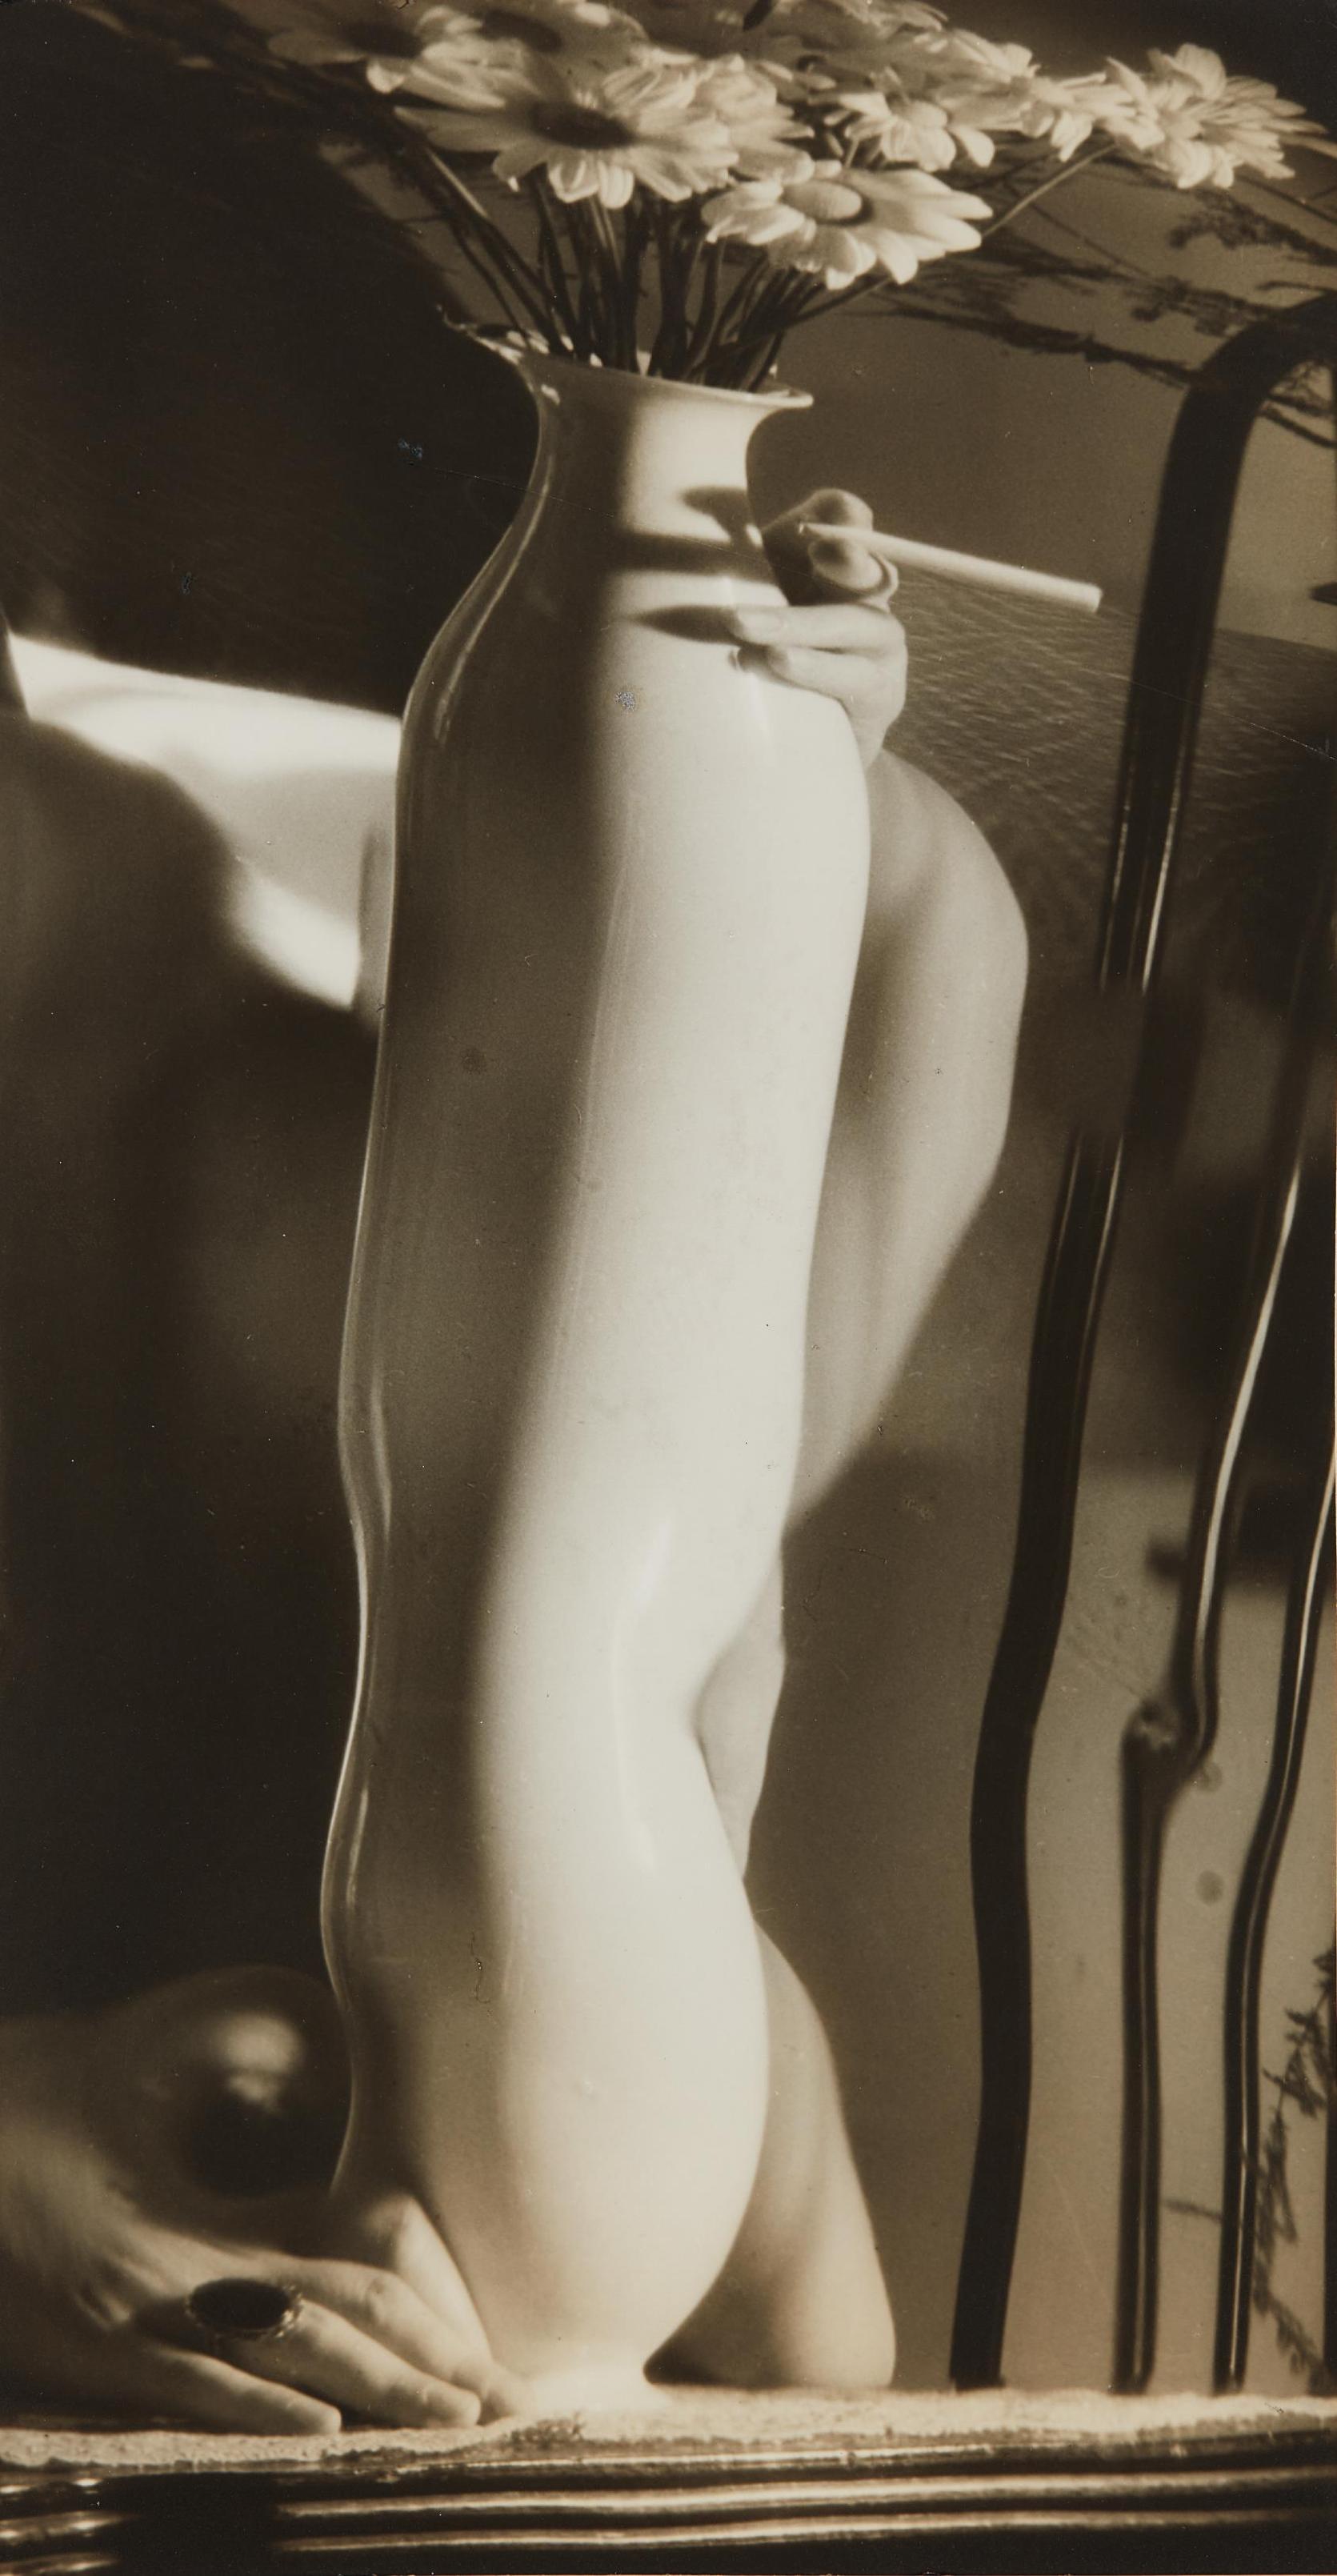 Andre Kertesz-Distortion With Vase-1930